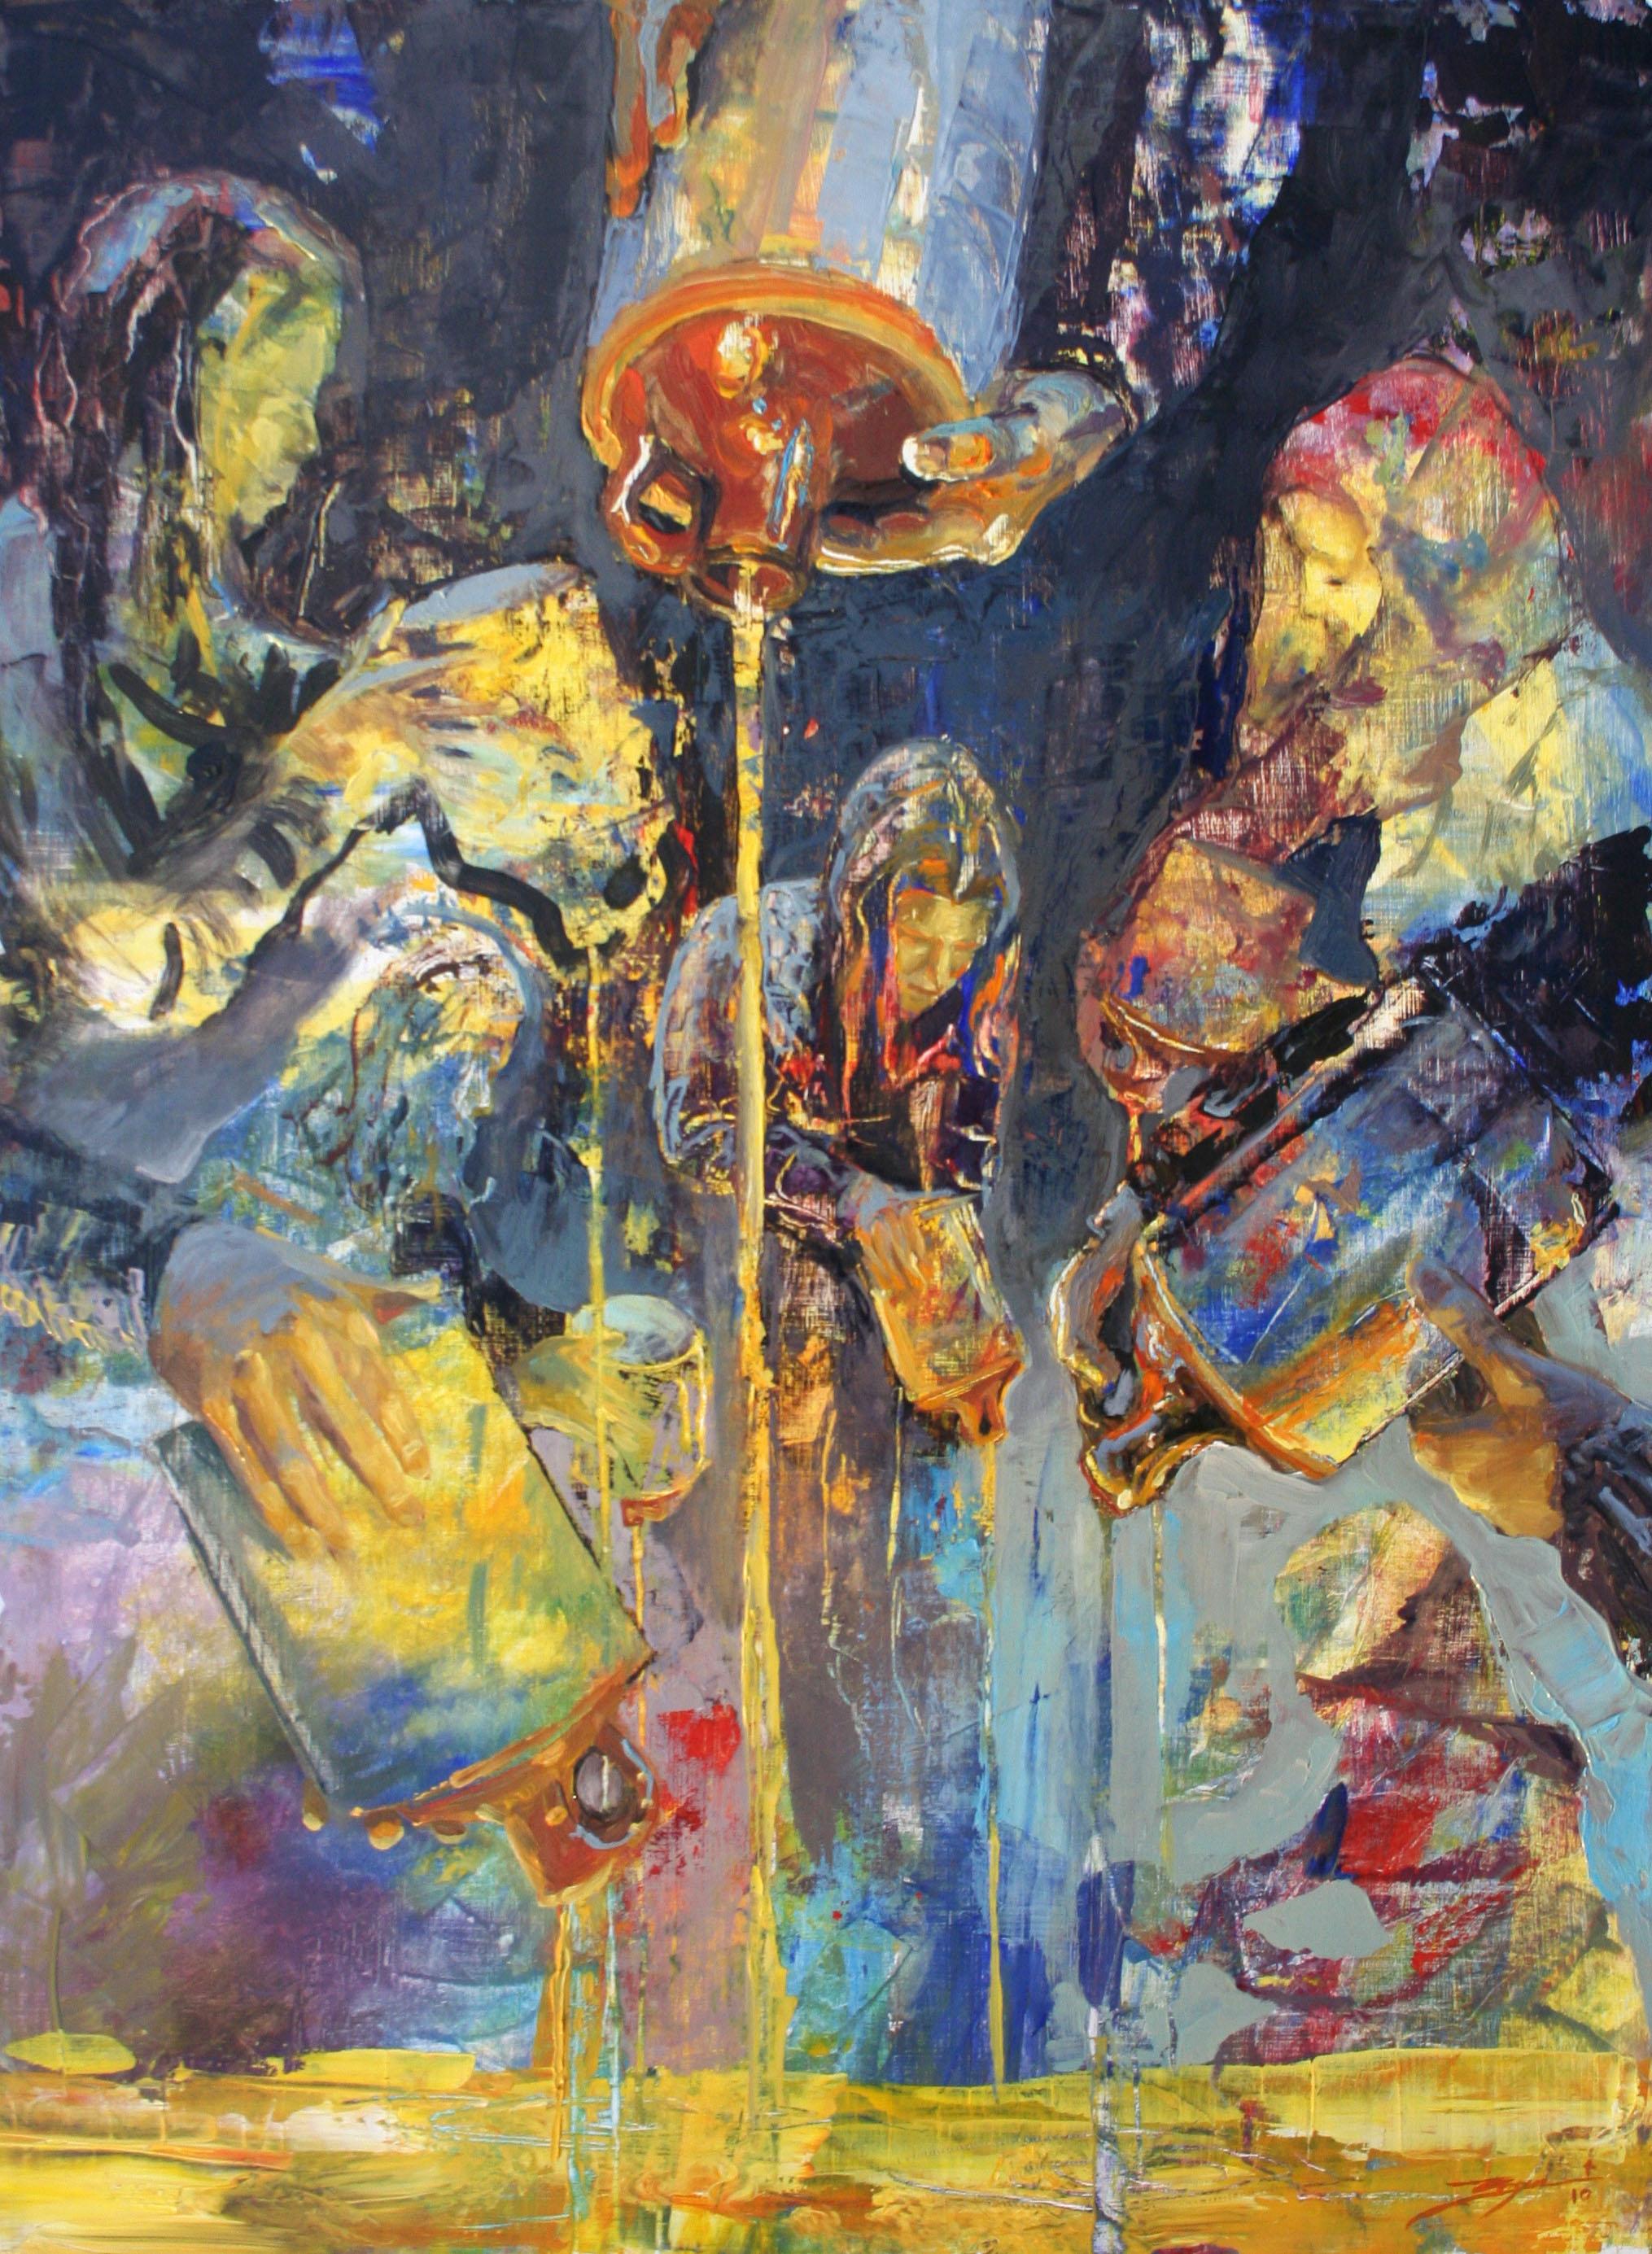 """Widow's Oil"". Oil on panel. 24x36"". 2011."